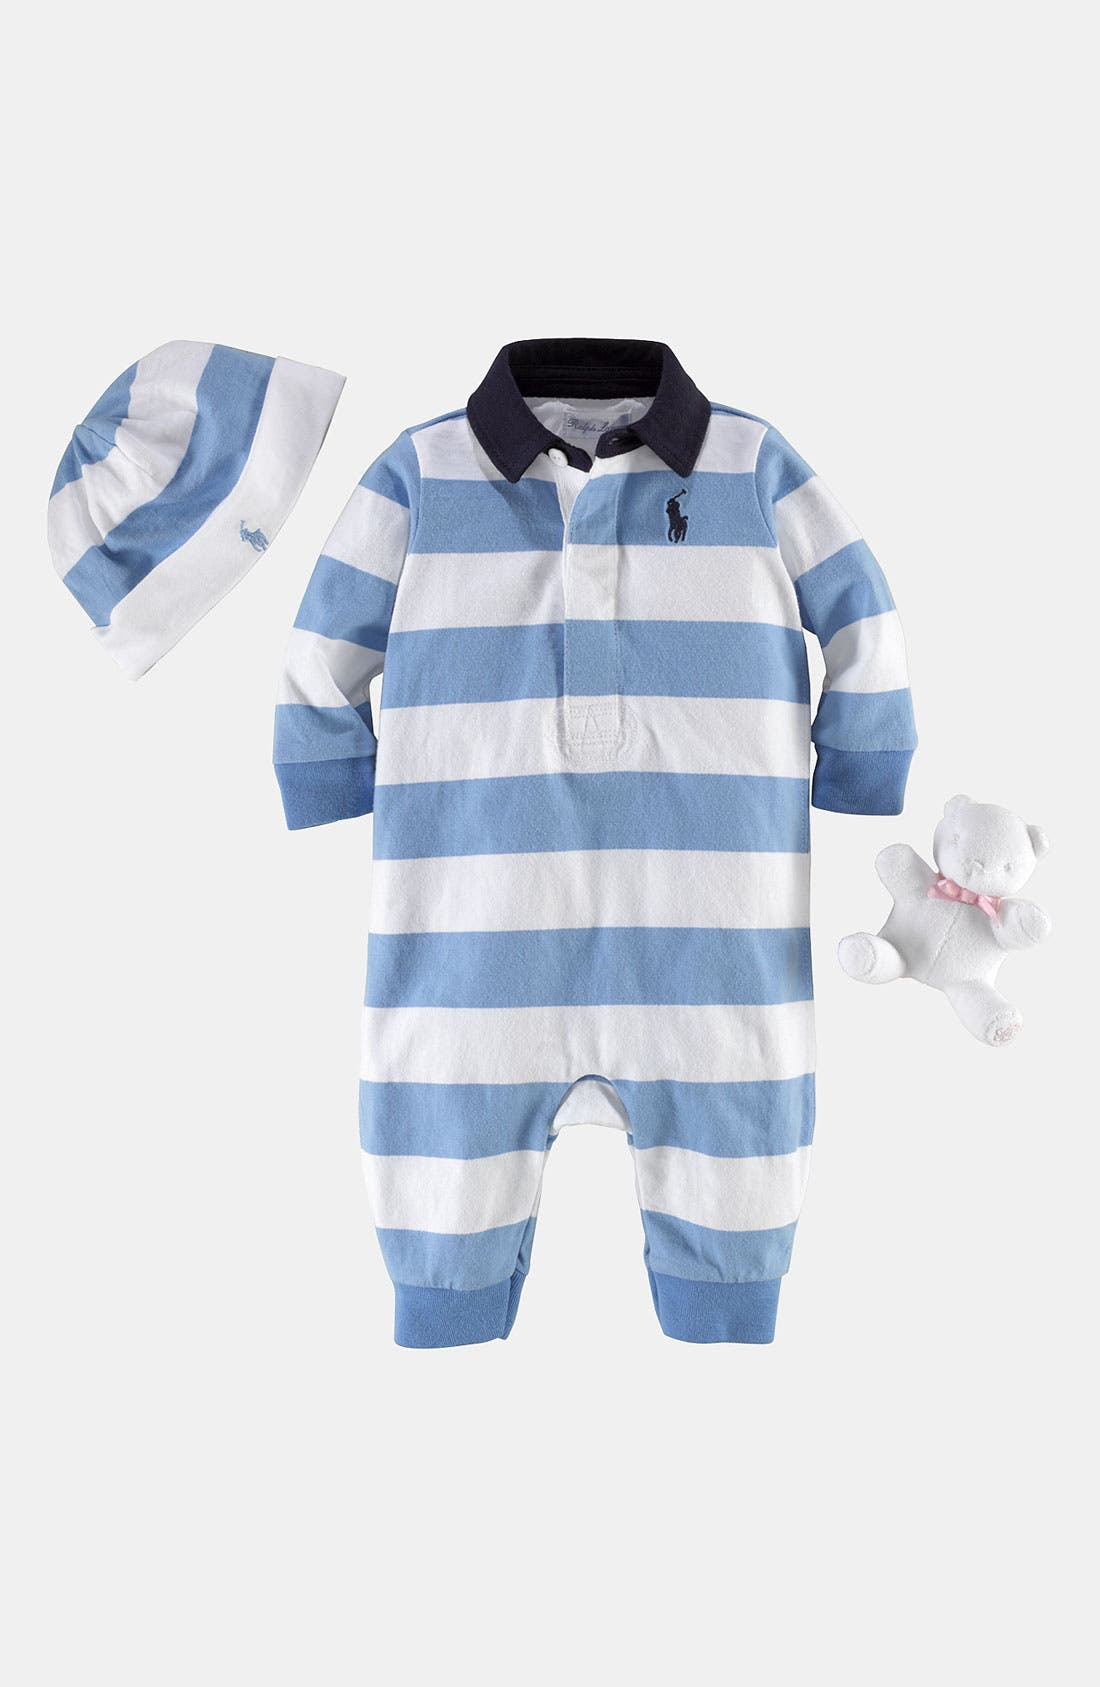 Alternate Image 1 Selected - Ralph Lauren Romper, Hat & Stuffed Animal (Infant)